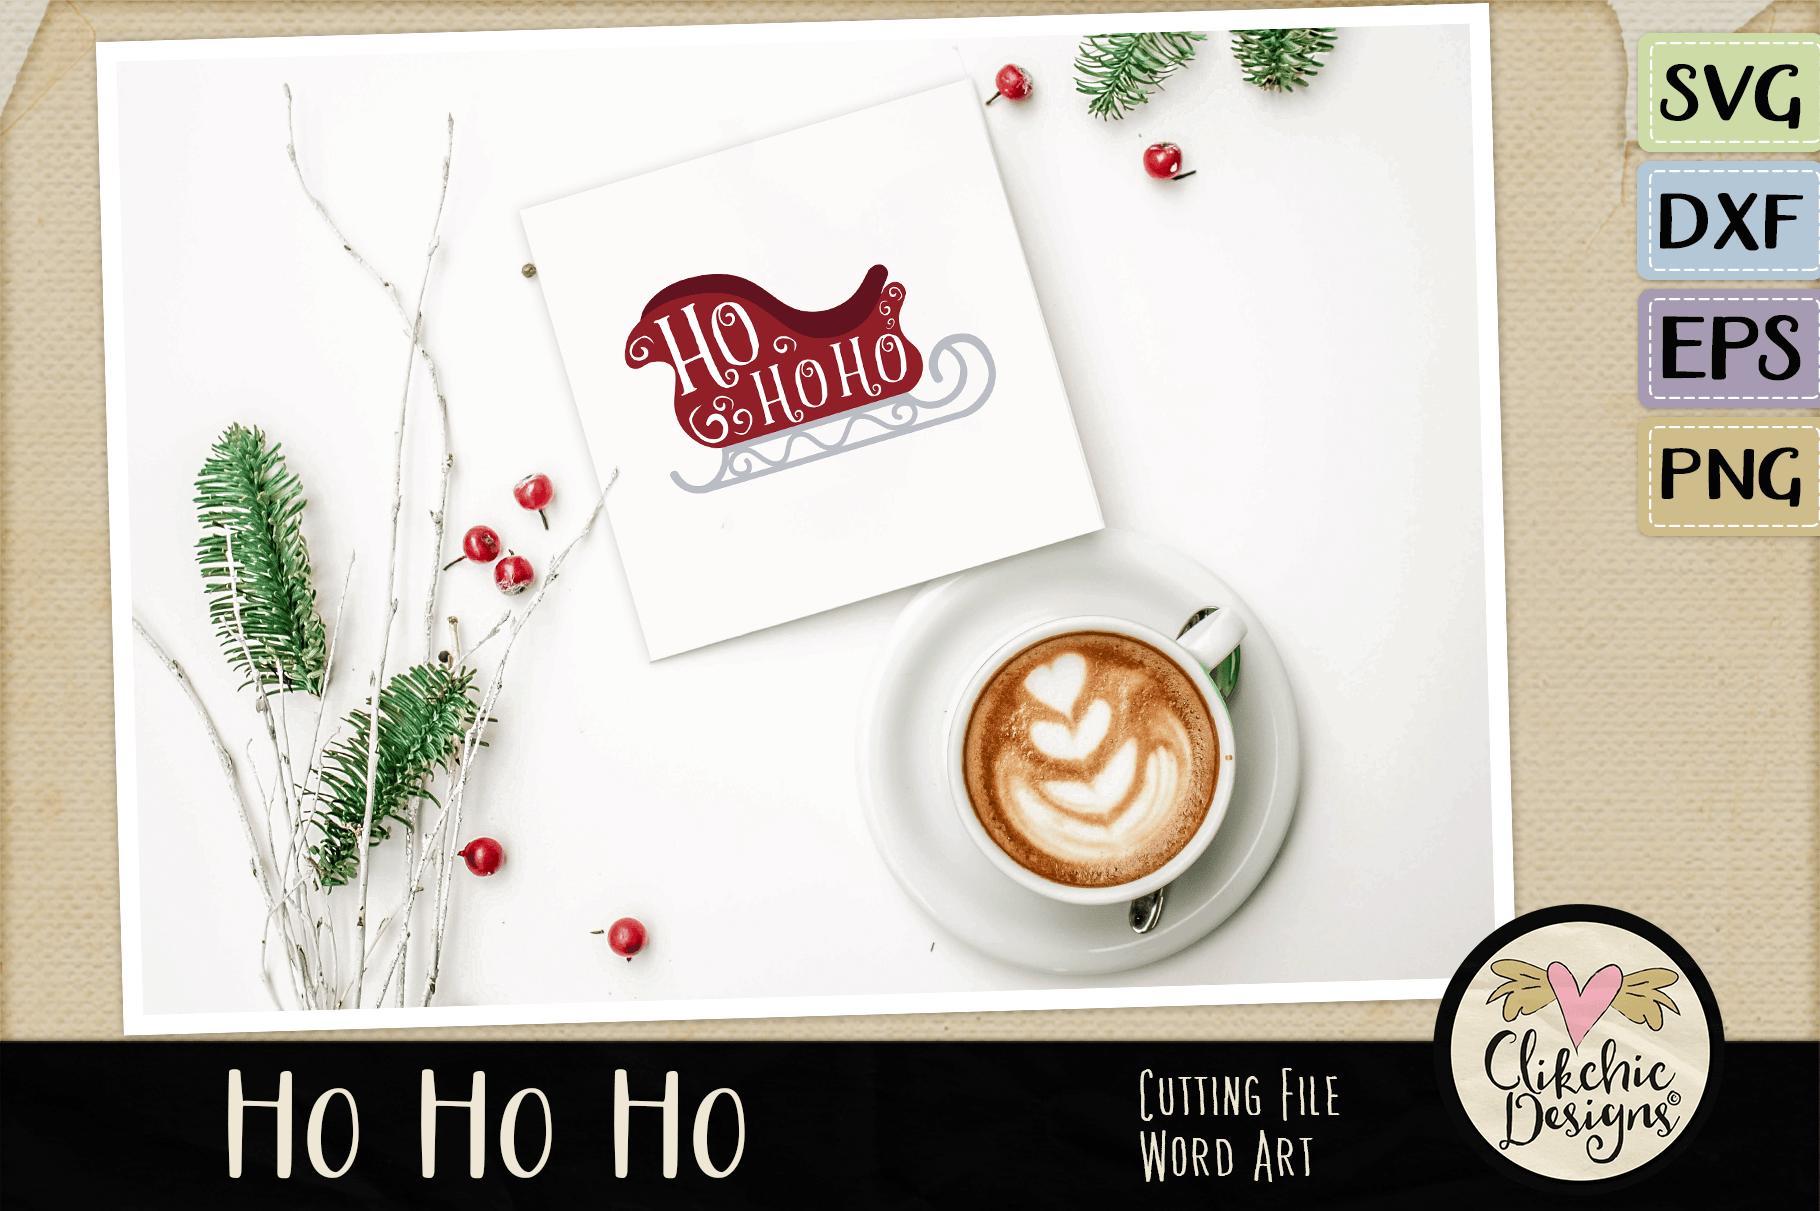 Chistmas SVG - Ho Ho Ho Santa's Sleigh Word Art Clipart example image 4